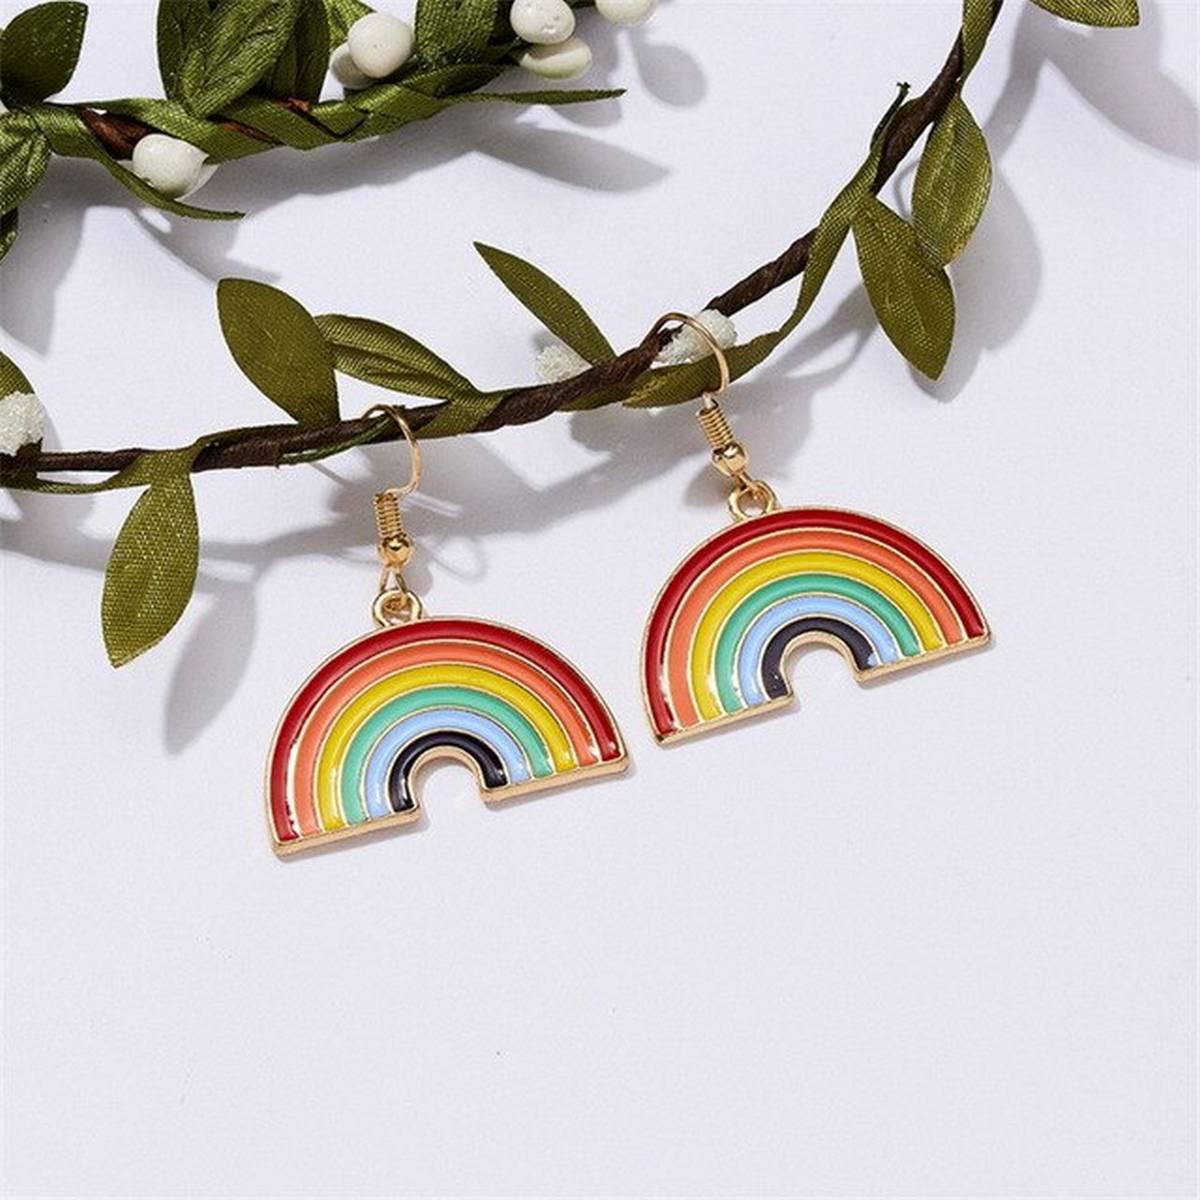 Fashion Jewelry 1 Pair Of Metal Rainbow Drop Earrings For Women